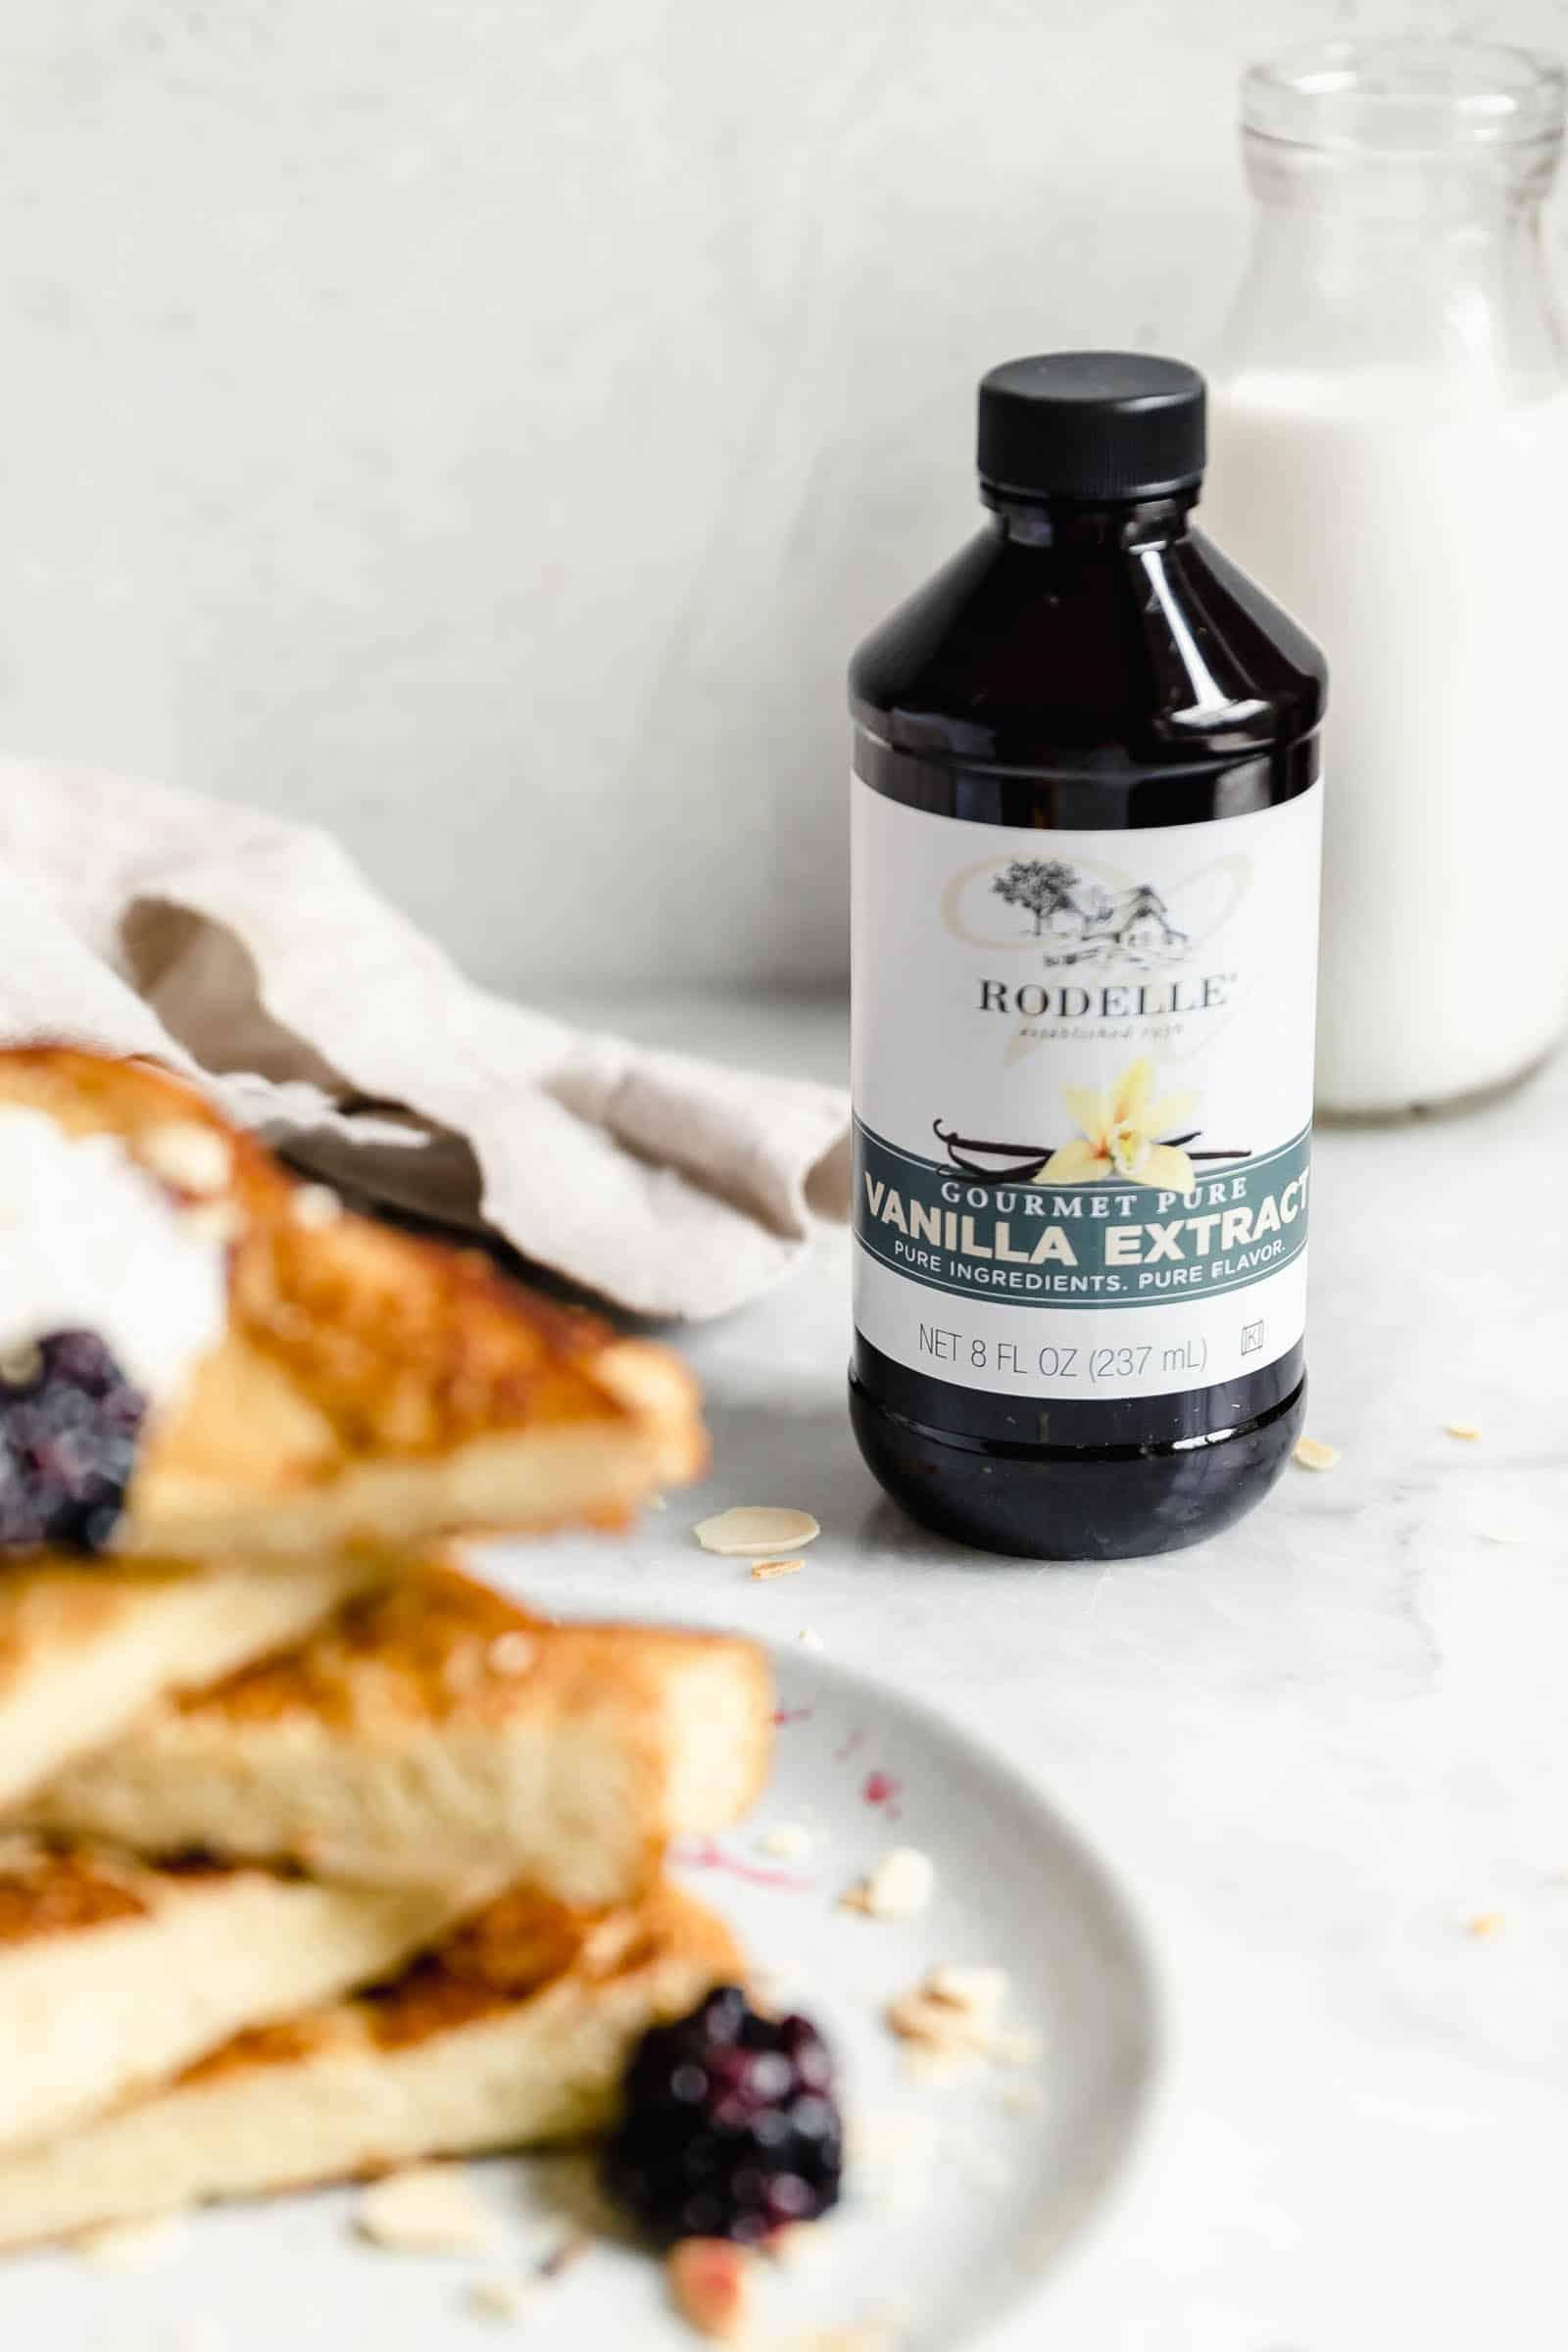 rodelle vanilla extract with vanilla french toast